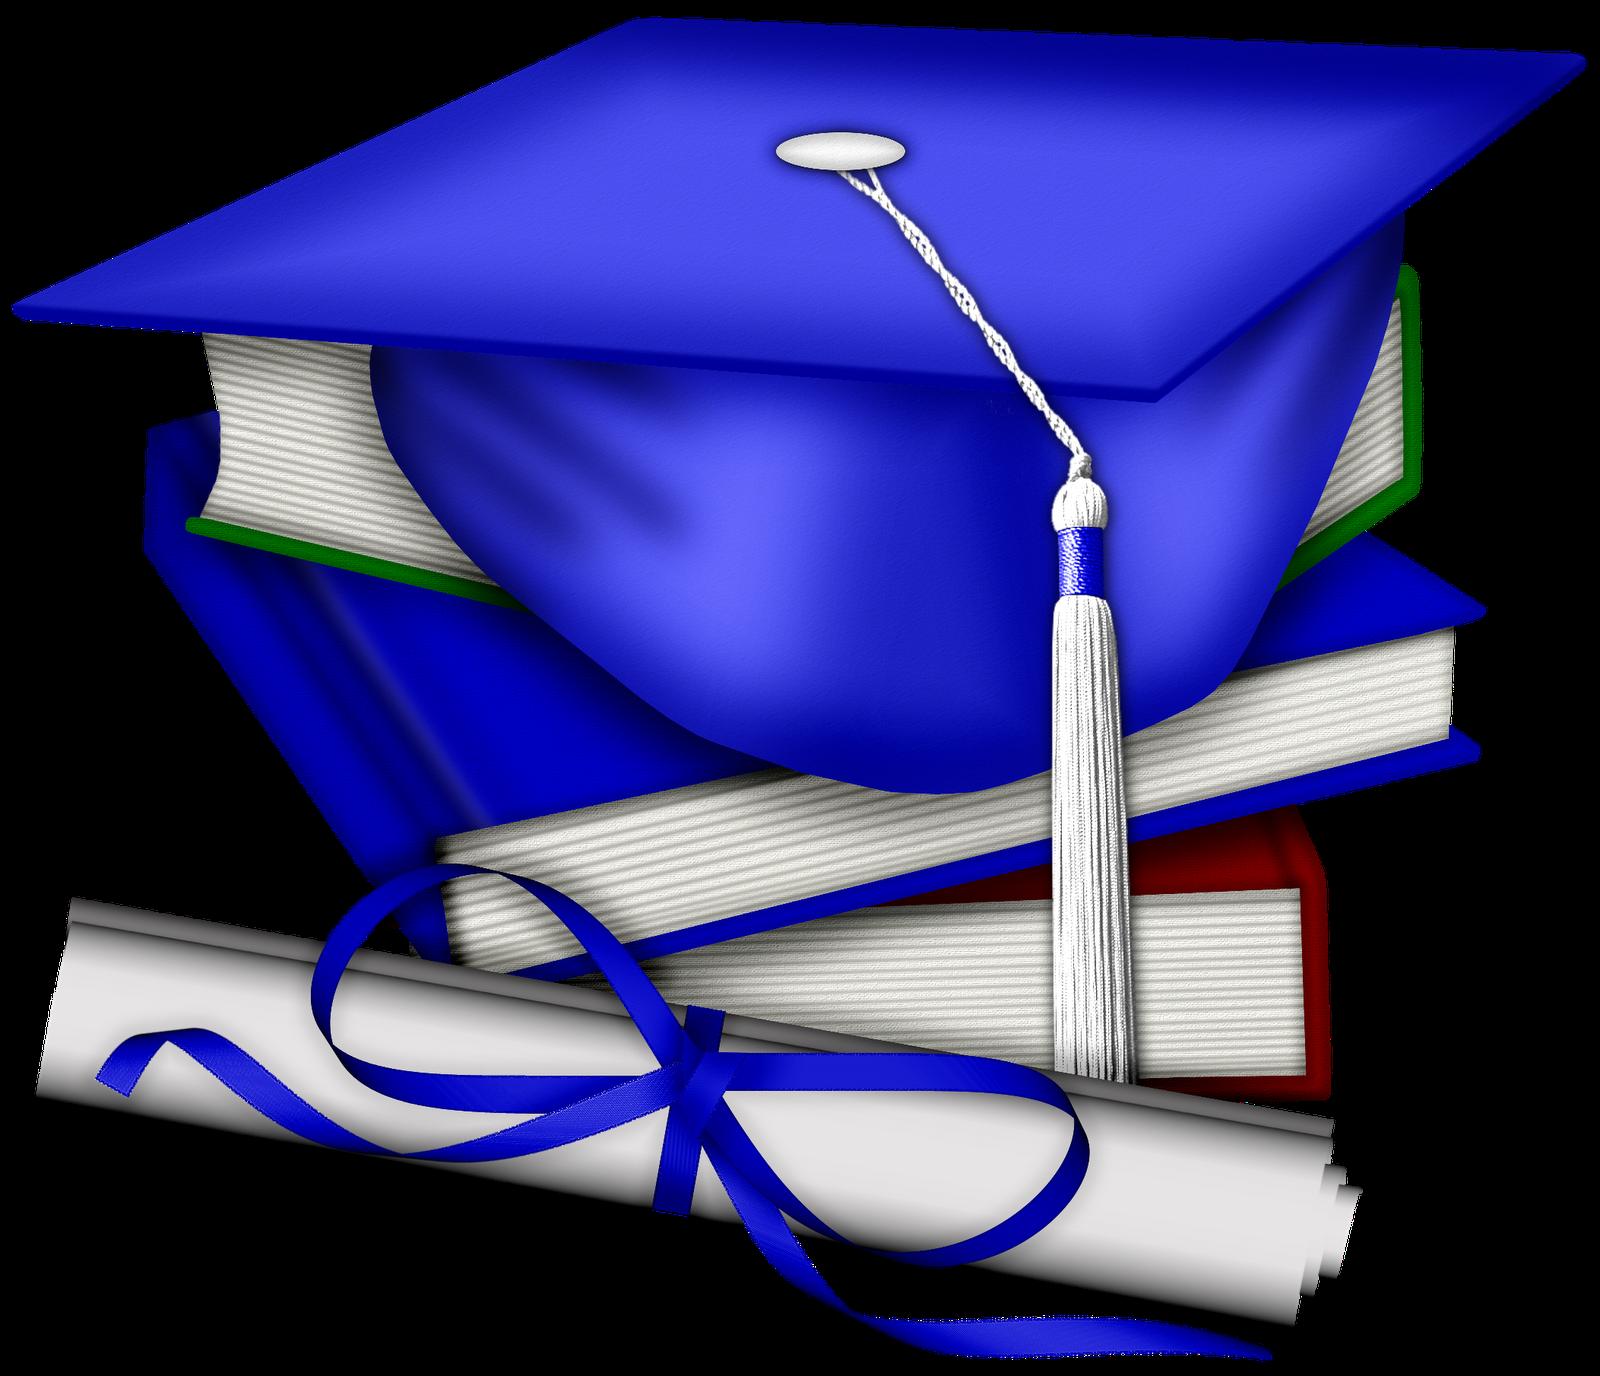 Escola formatura graduaci n. Stamp clipart diploma